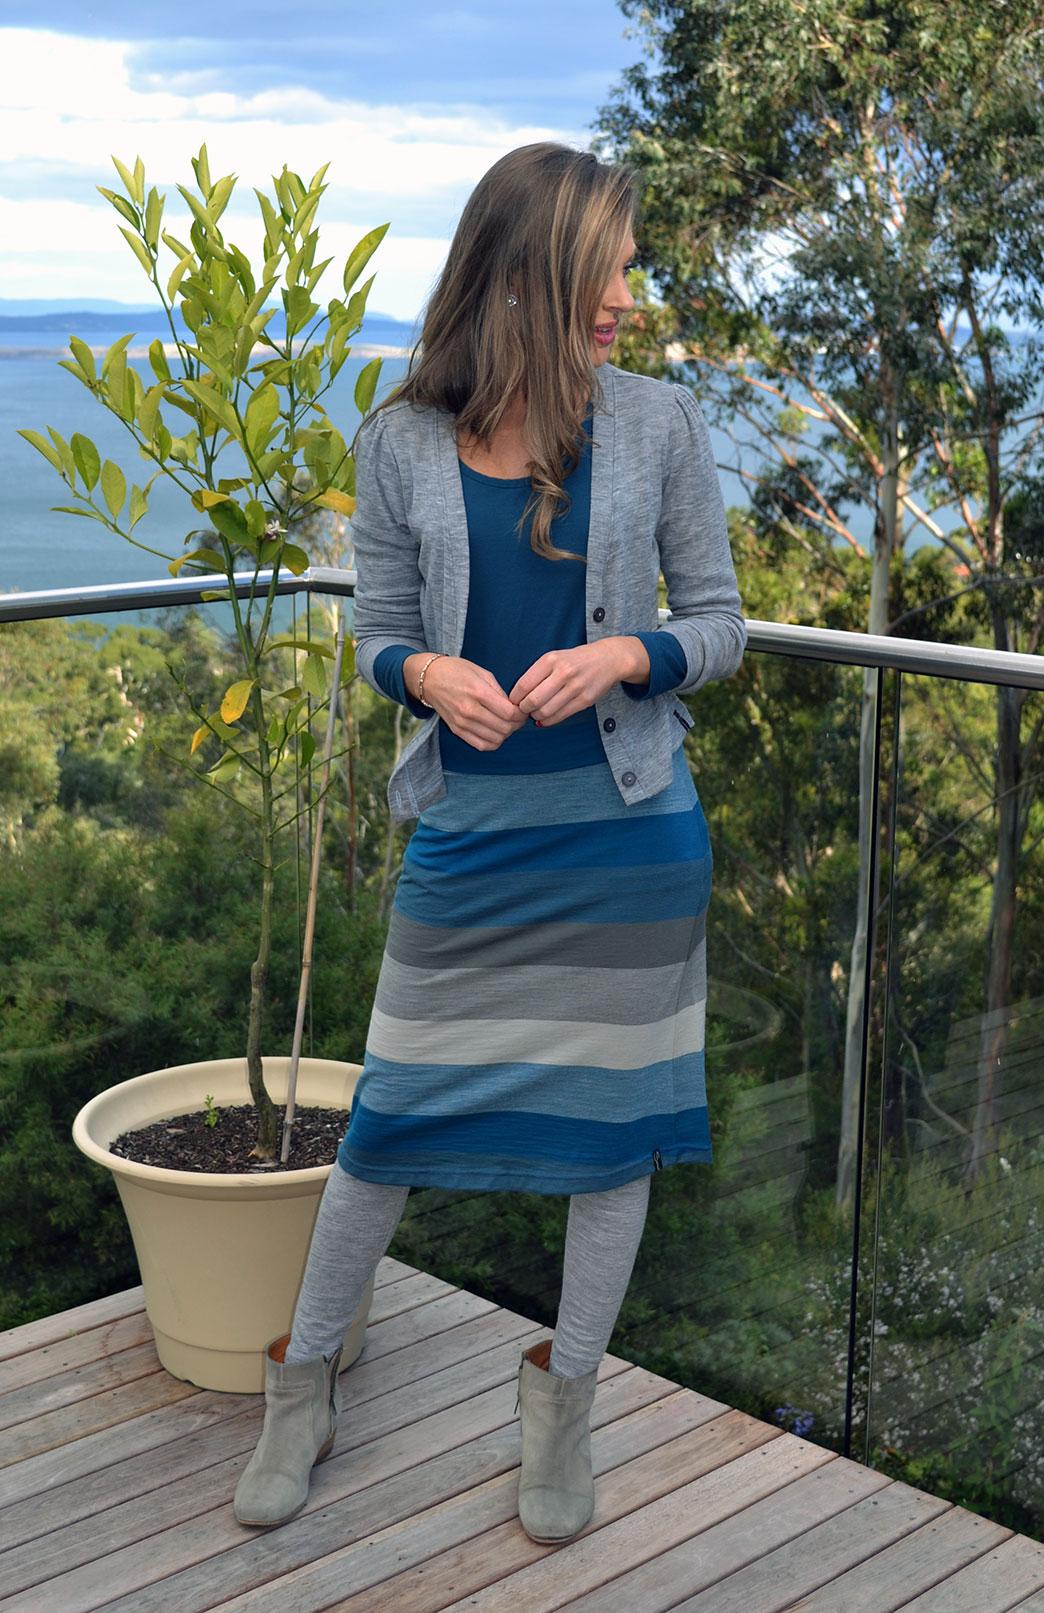 A-line Skirt - Pattern - Women's Teal Multi Stripe A-Line Wool Skirt - Smitten Merino Tasmania Australia